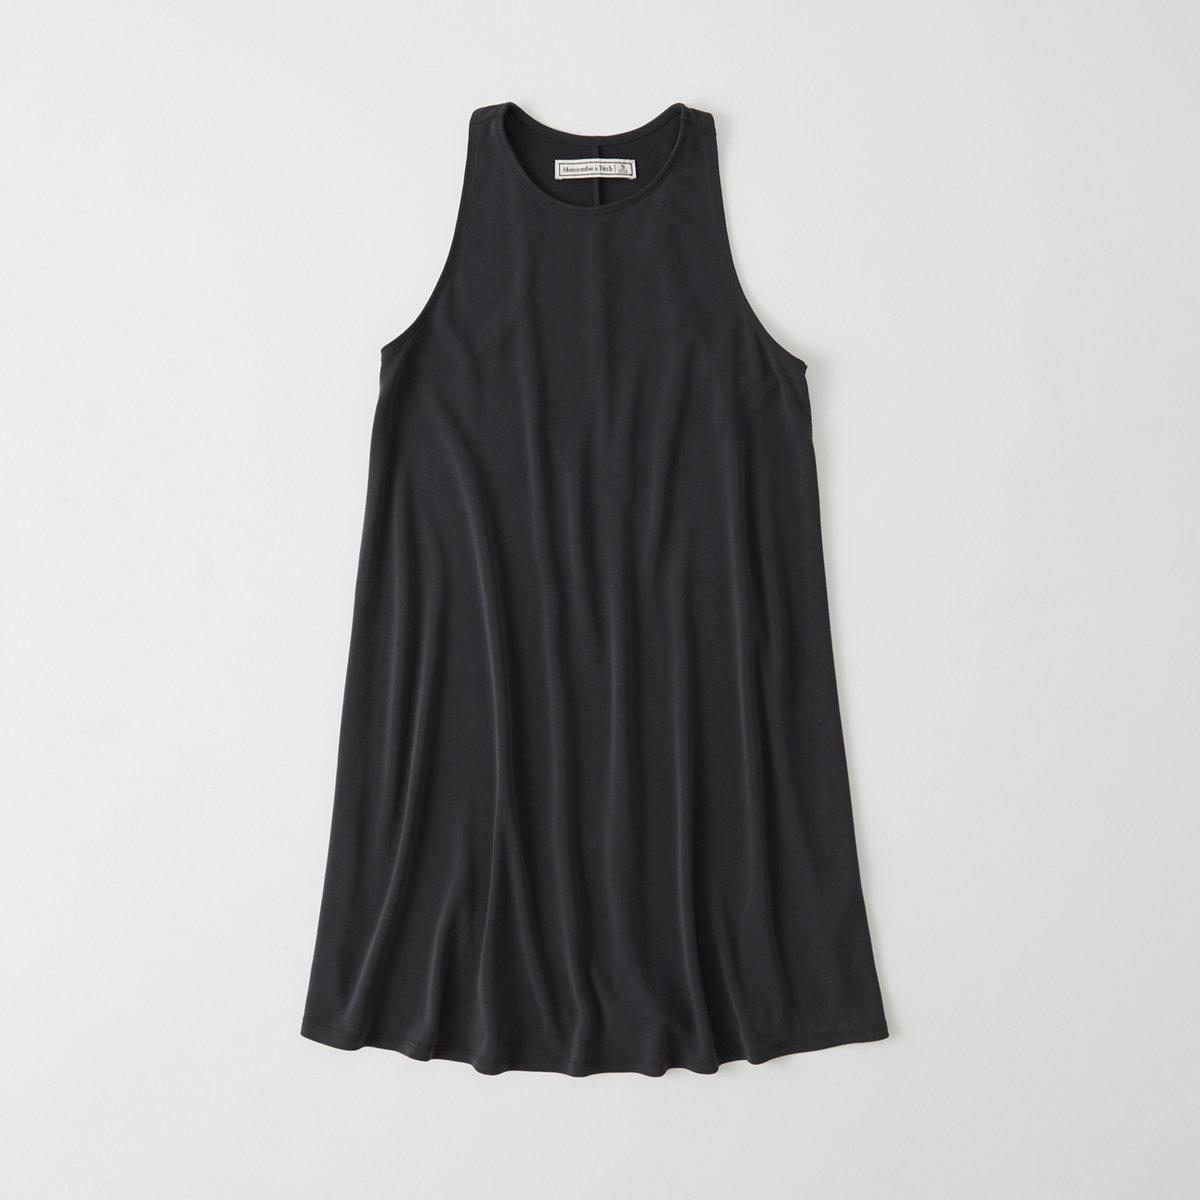 Racerback Tank Dress